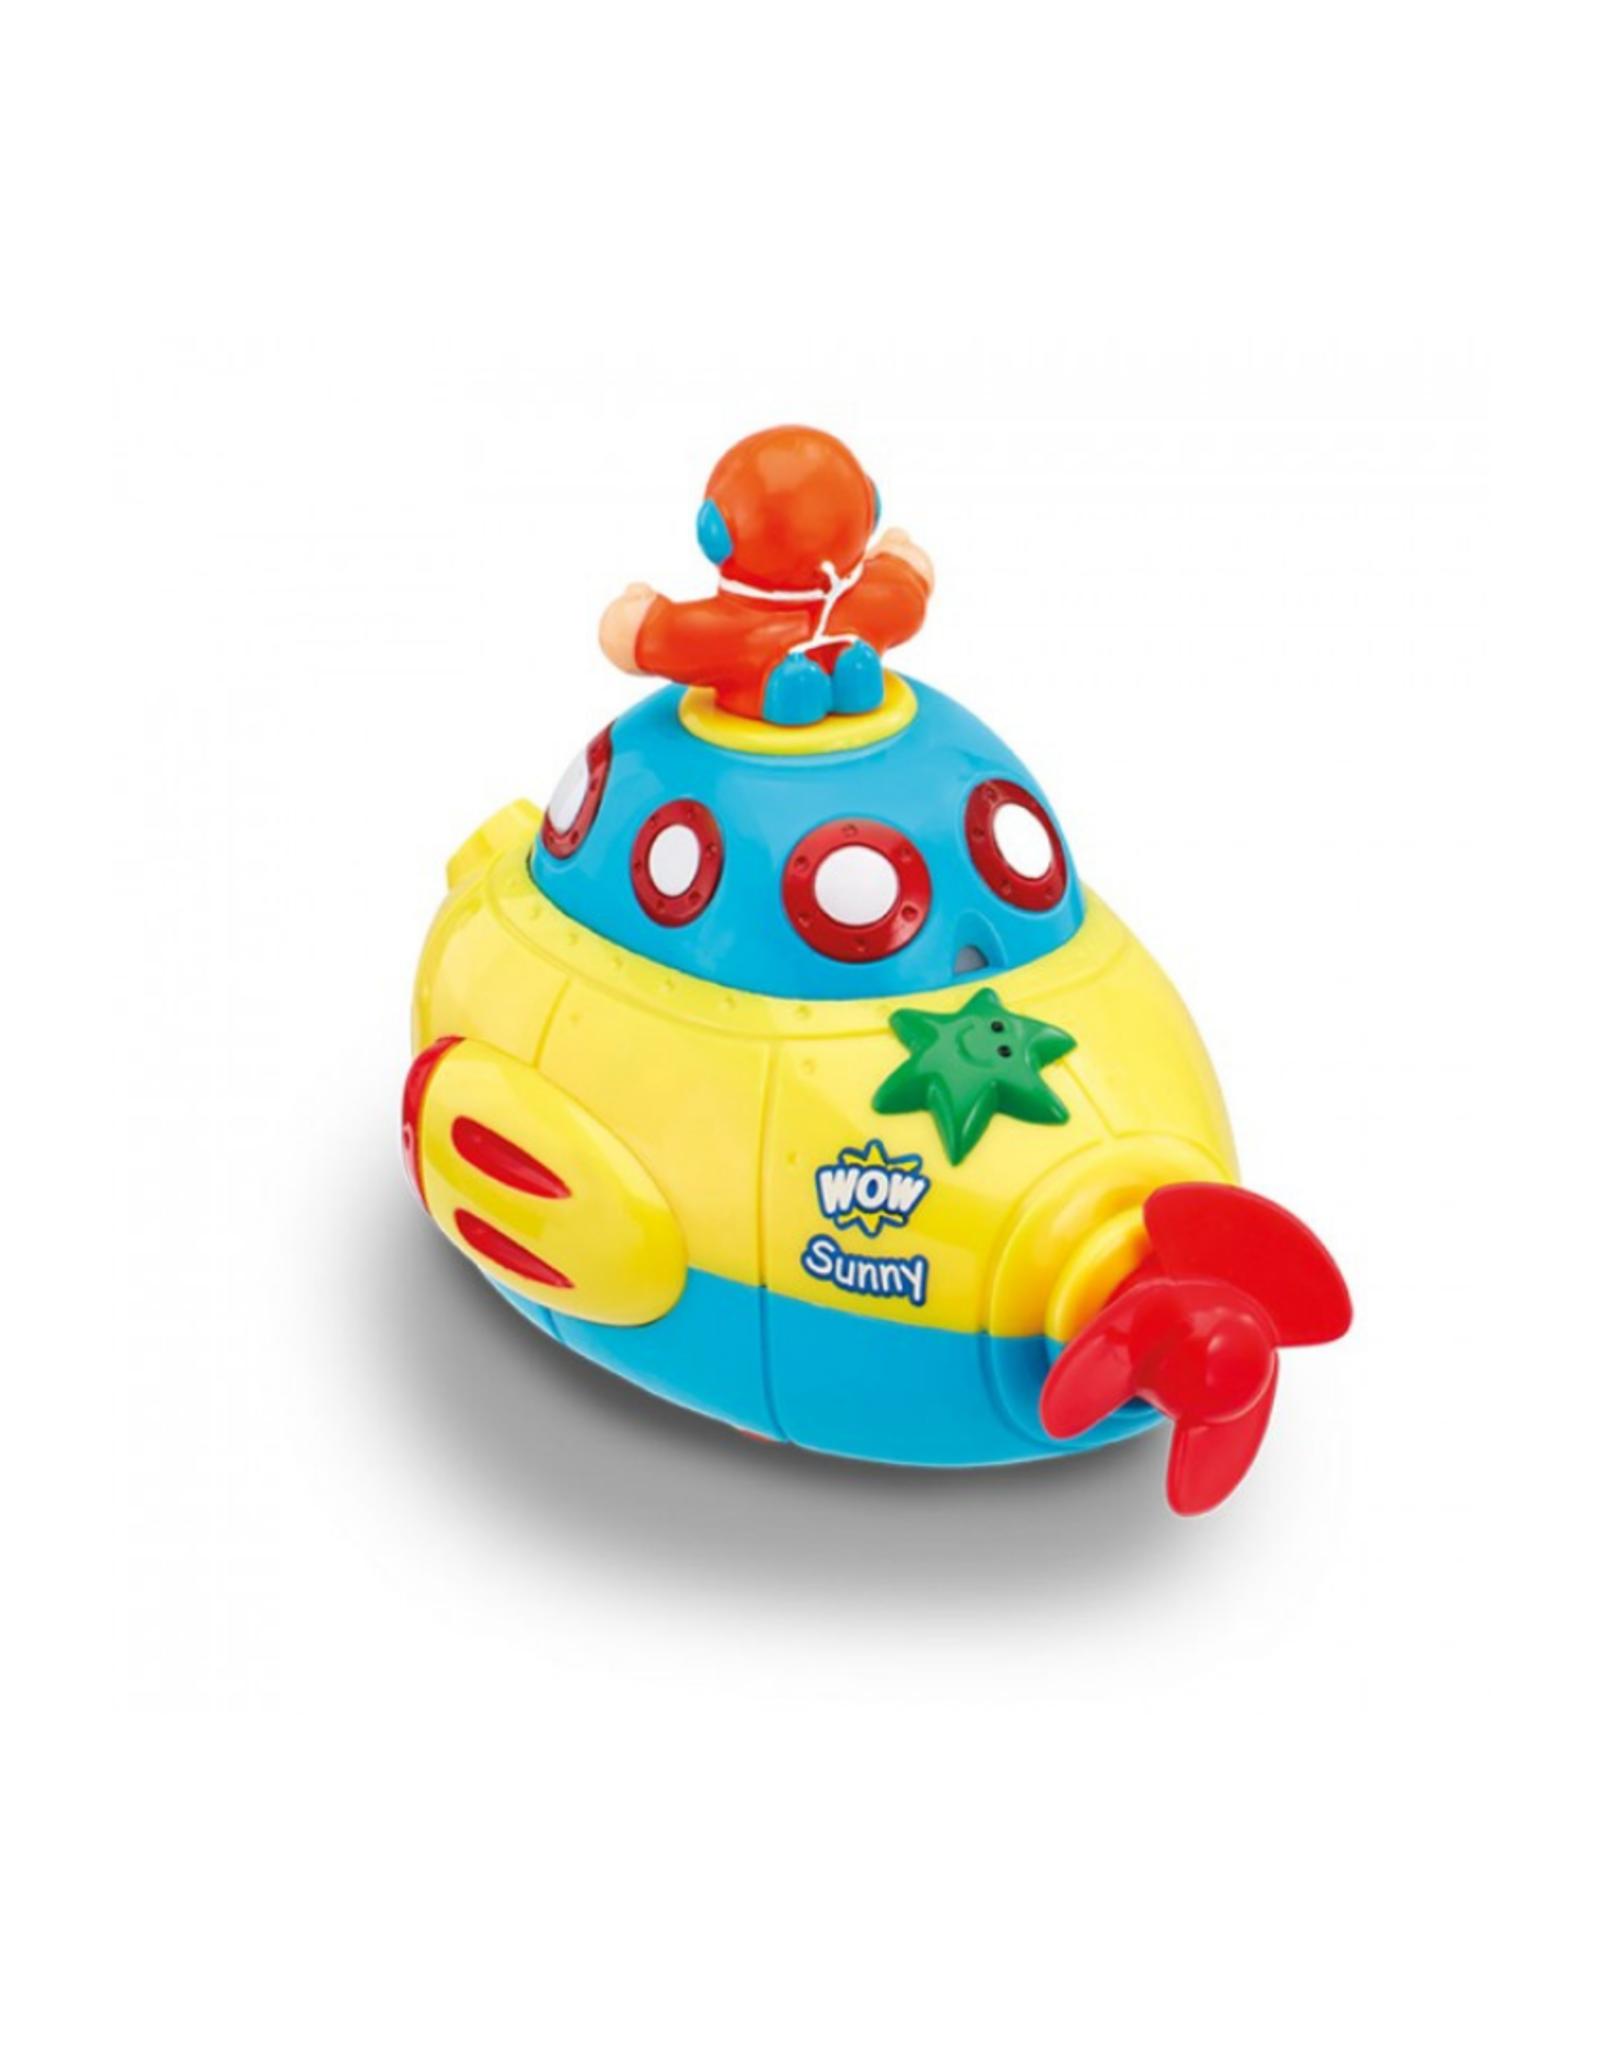 WOW Toys WOW Toys - Sunny Submarine